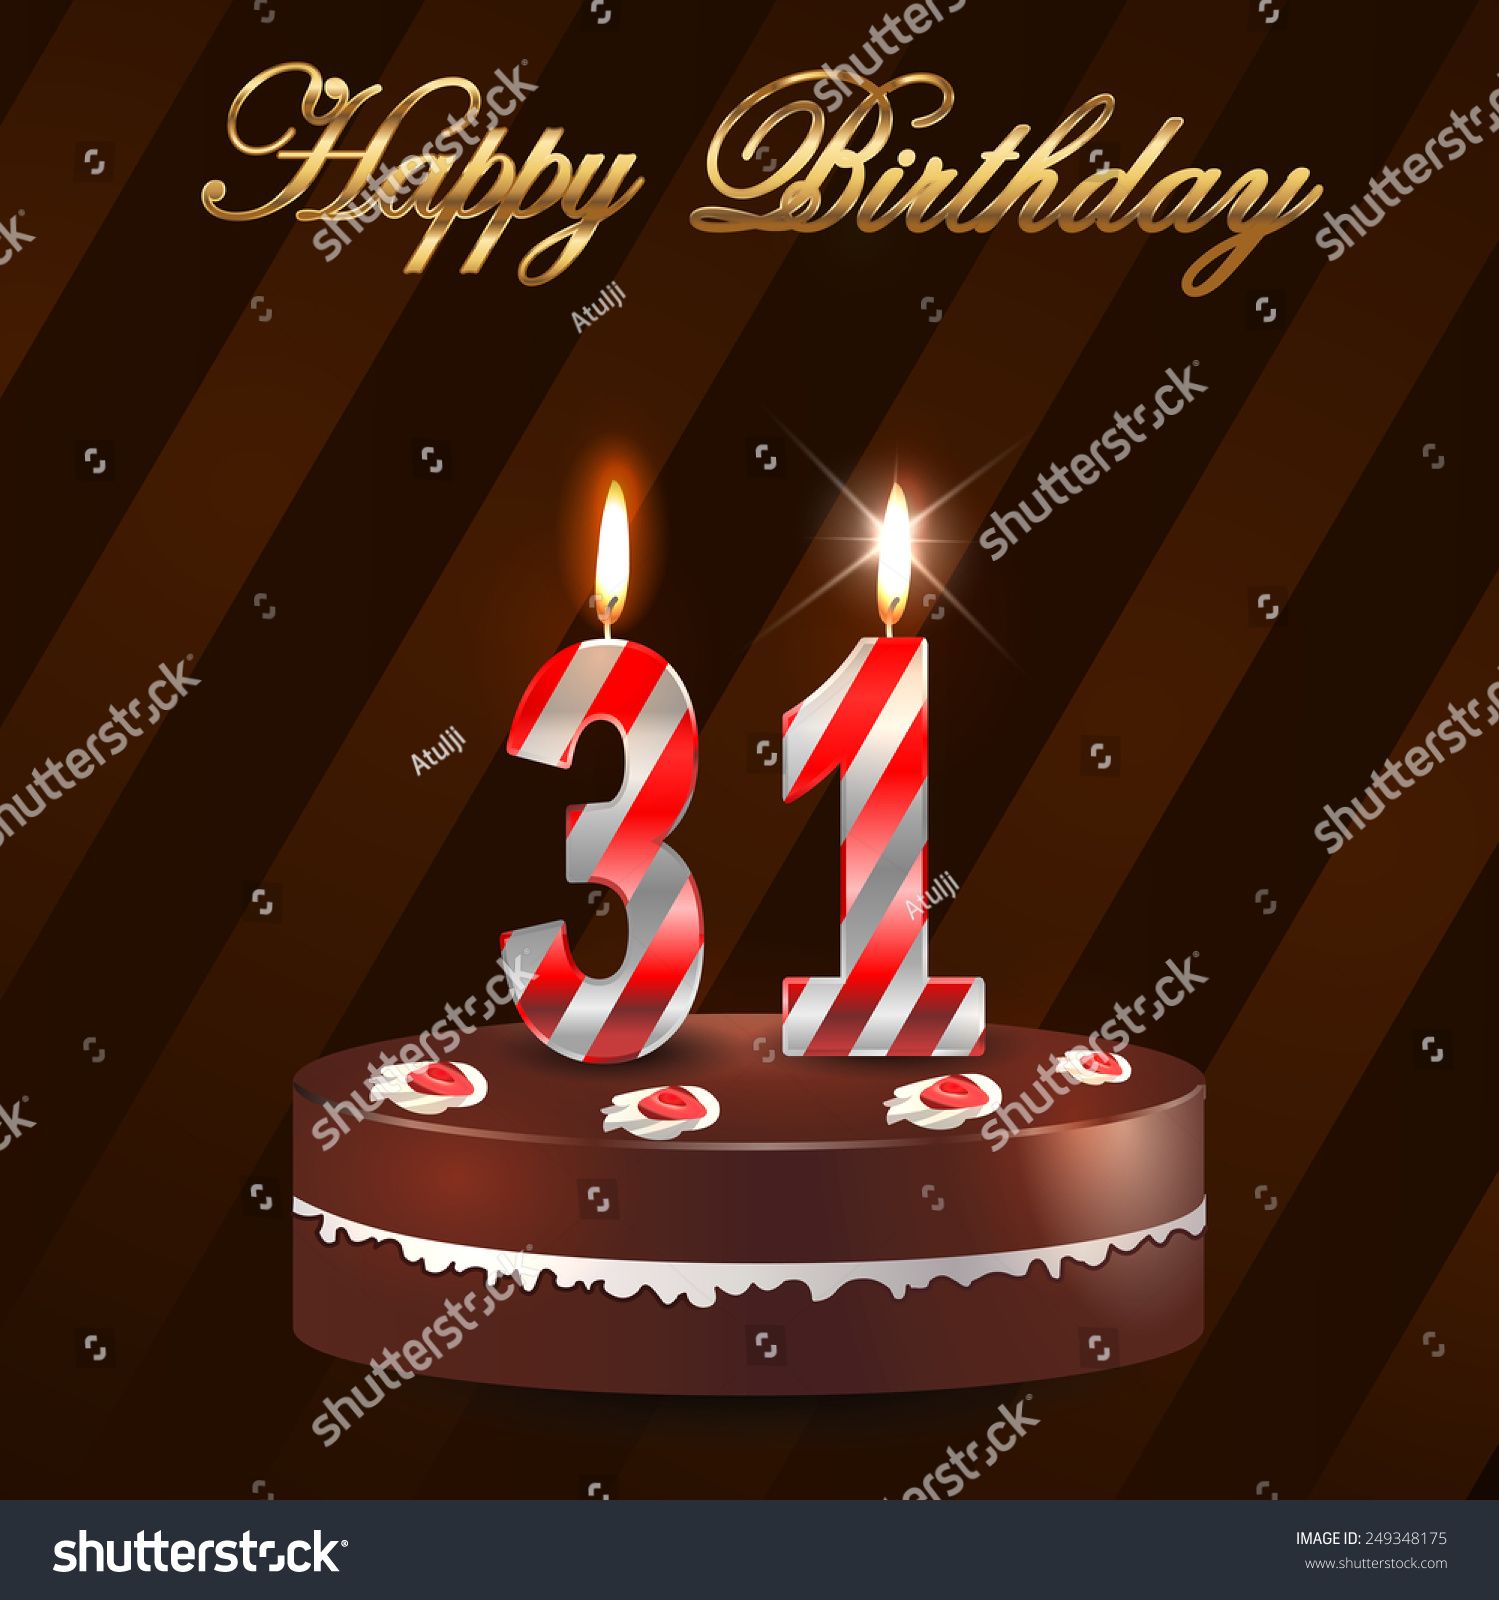 31 Year Happy Birthday Card Cake Stock Vector Royalty Free